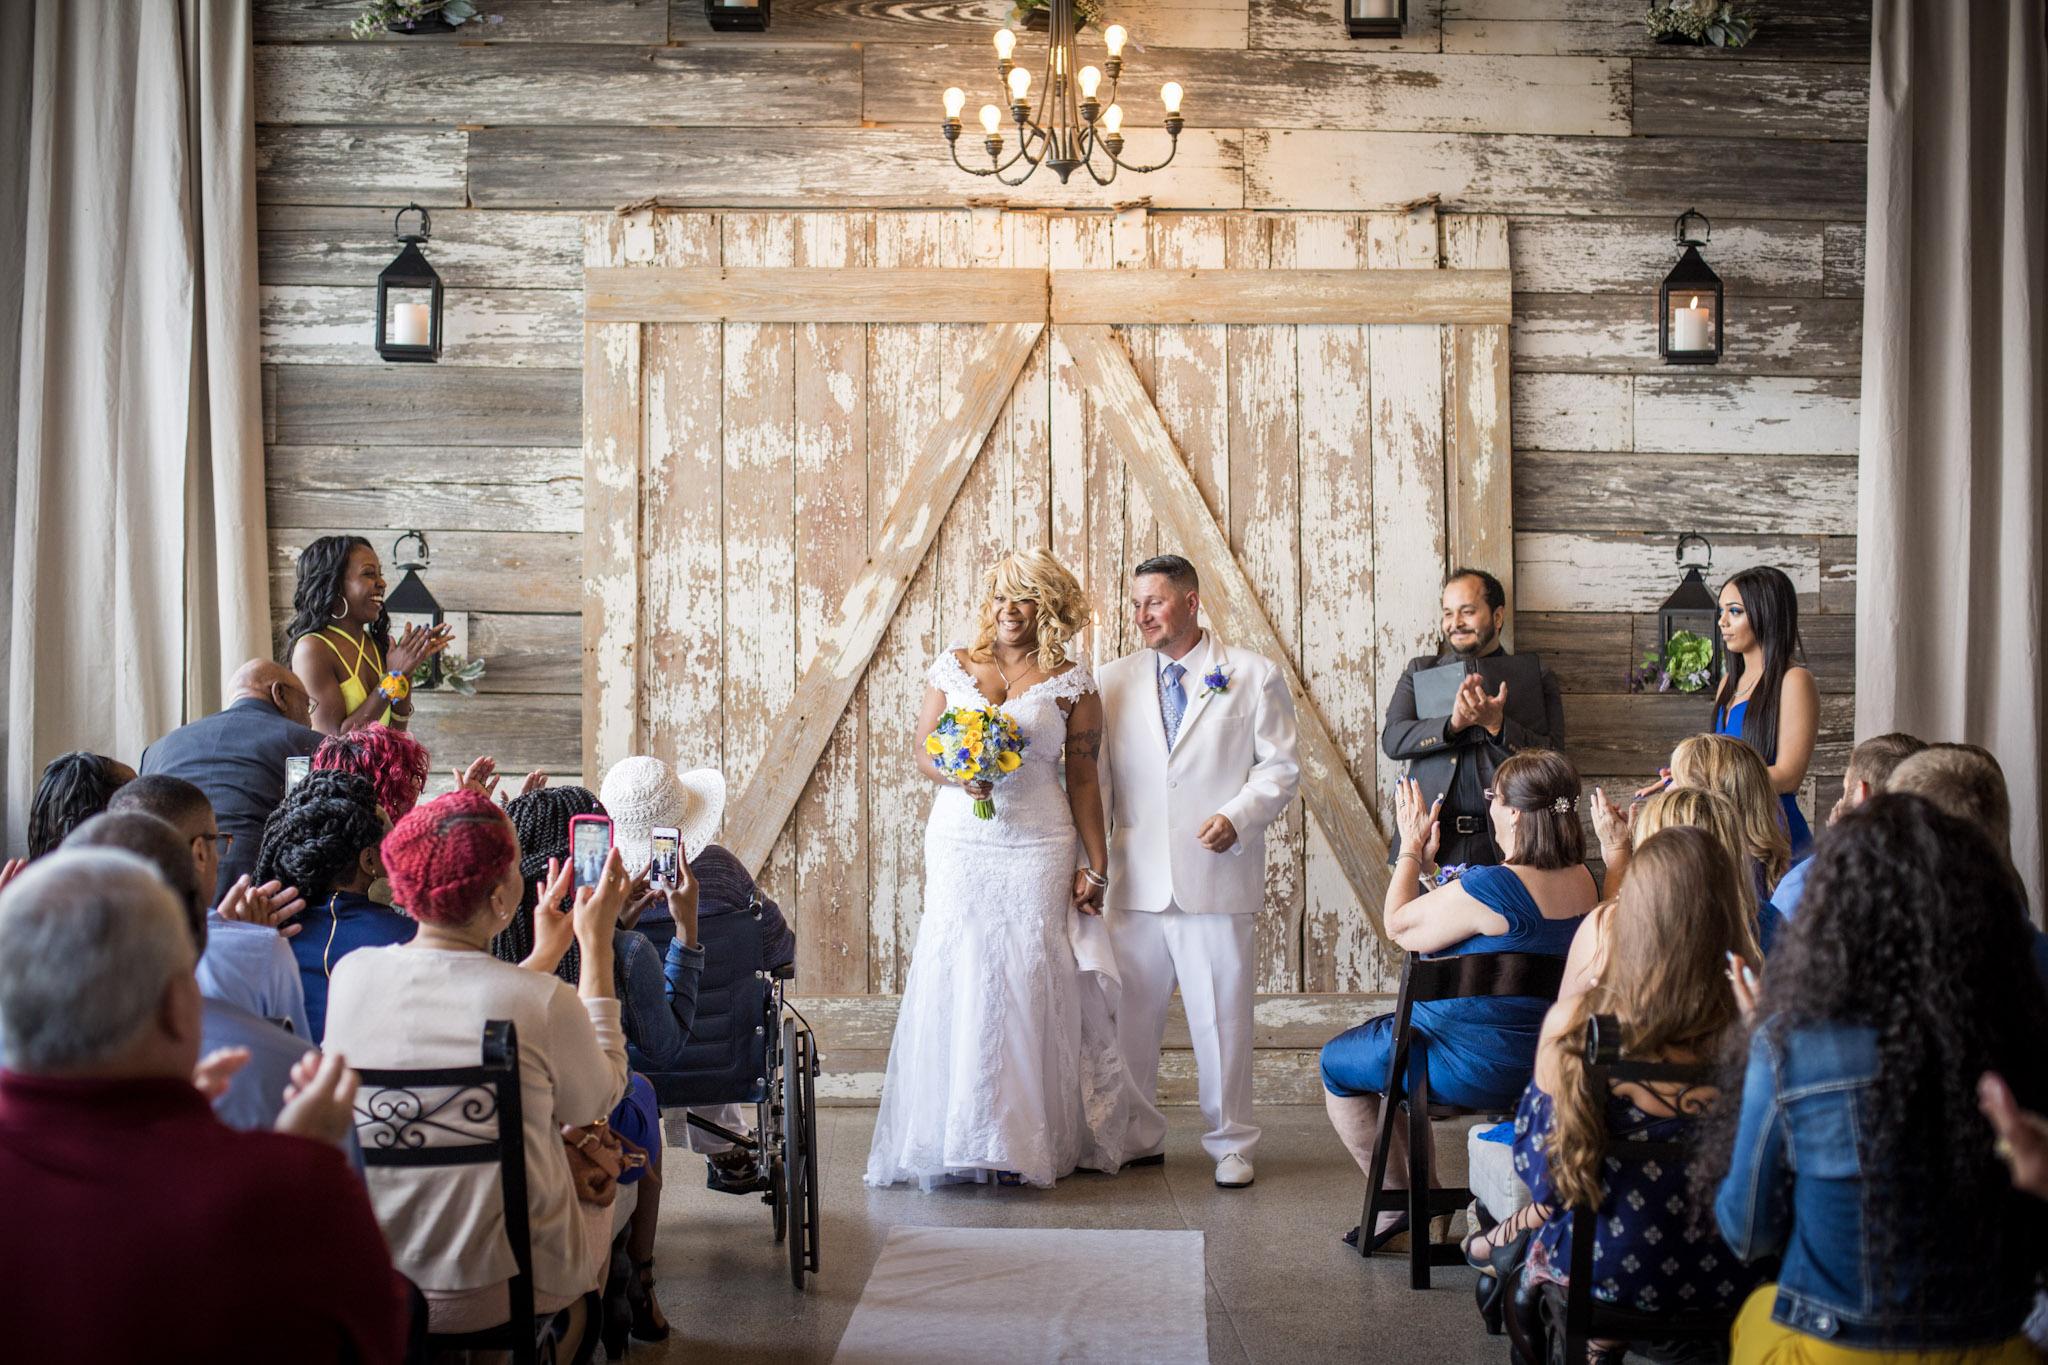 The_Vow_Exchange_Kansas_City_Small_Budget_Wedding_Venue_Mico&Daniel-108.jpg